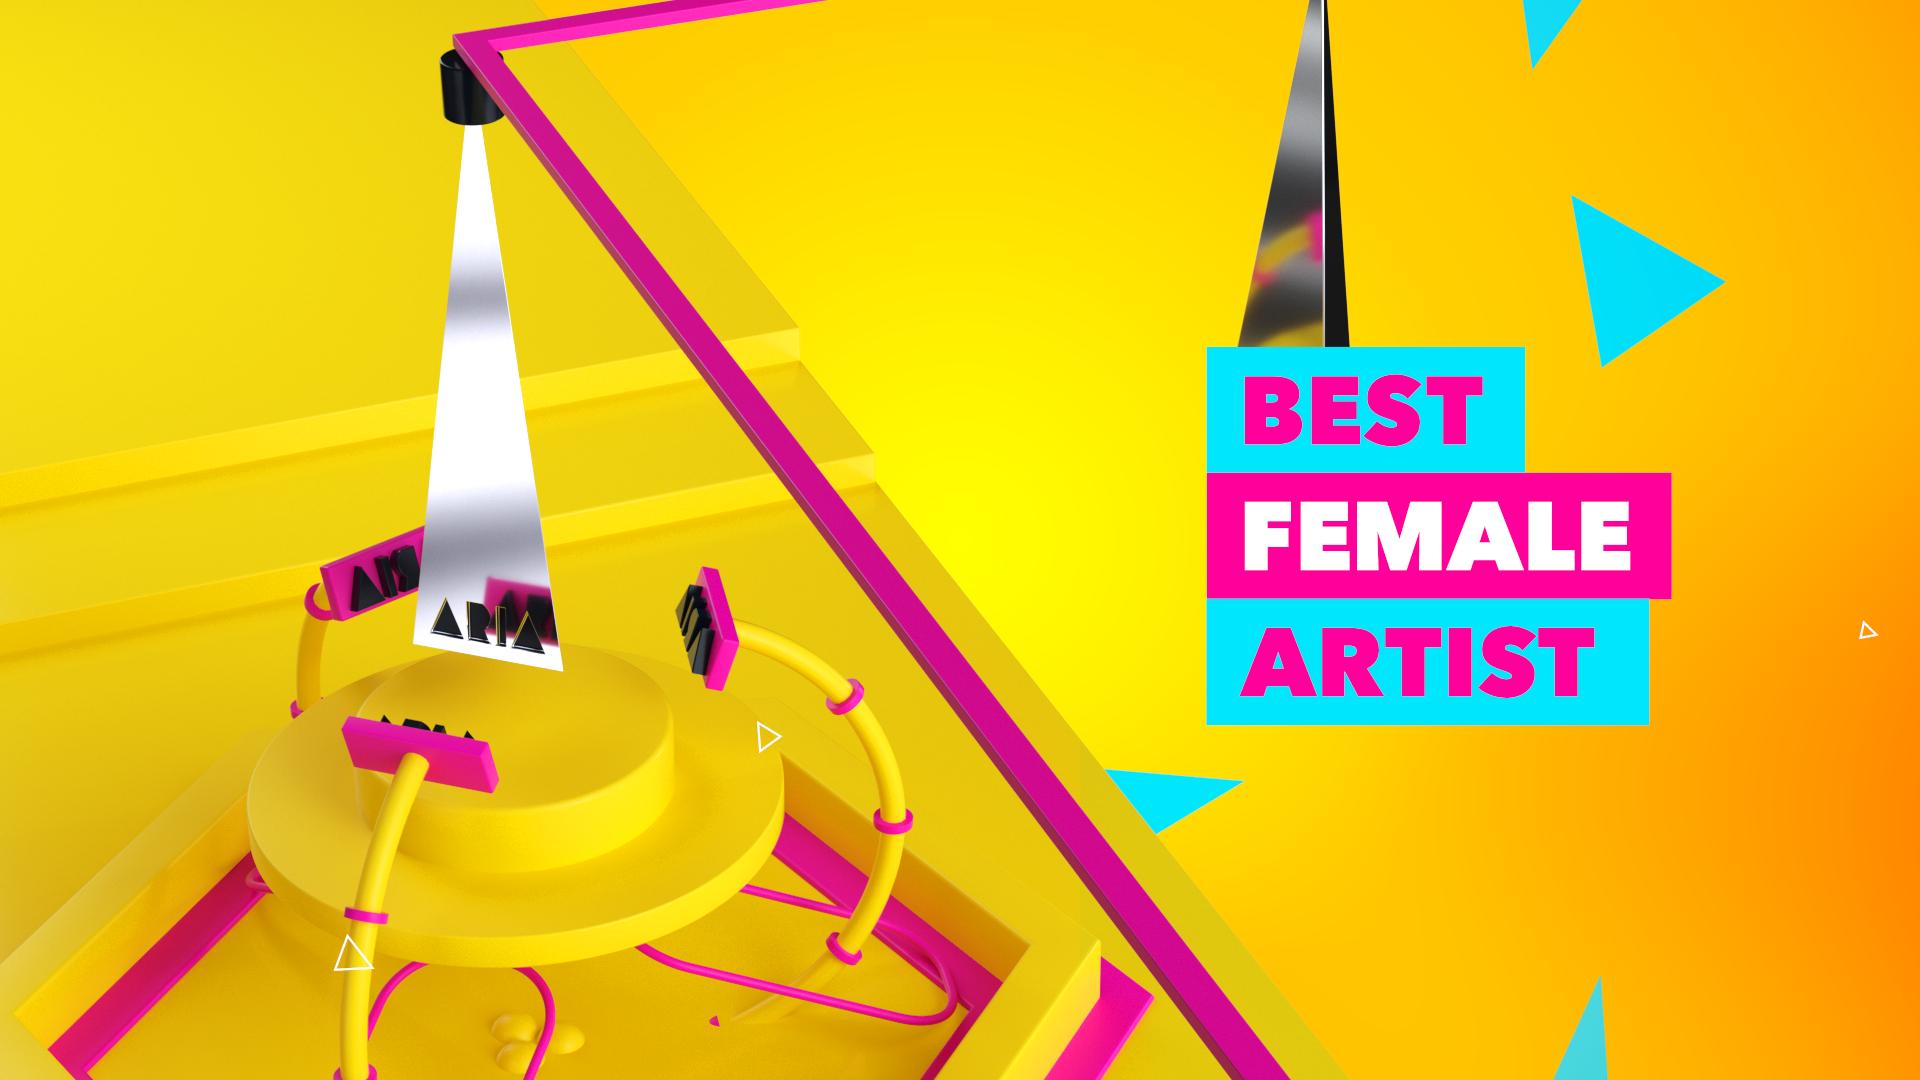 ARIAS 2018_Design_25 (converted)_Nomintro_Stamp_Female_2018-12-12_13.36.58.png